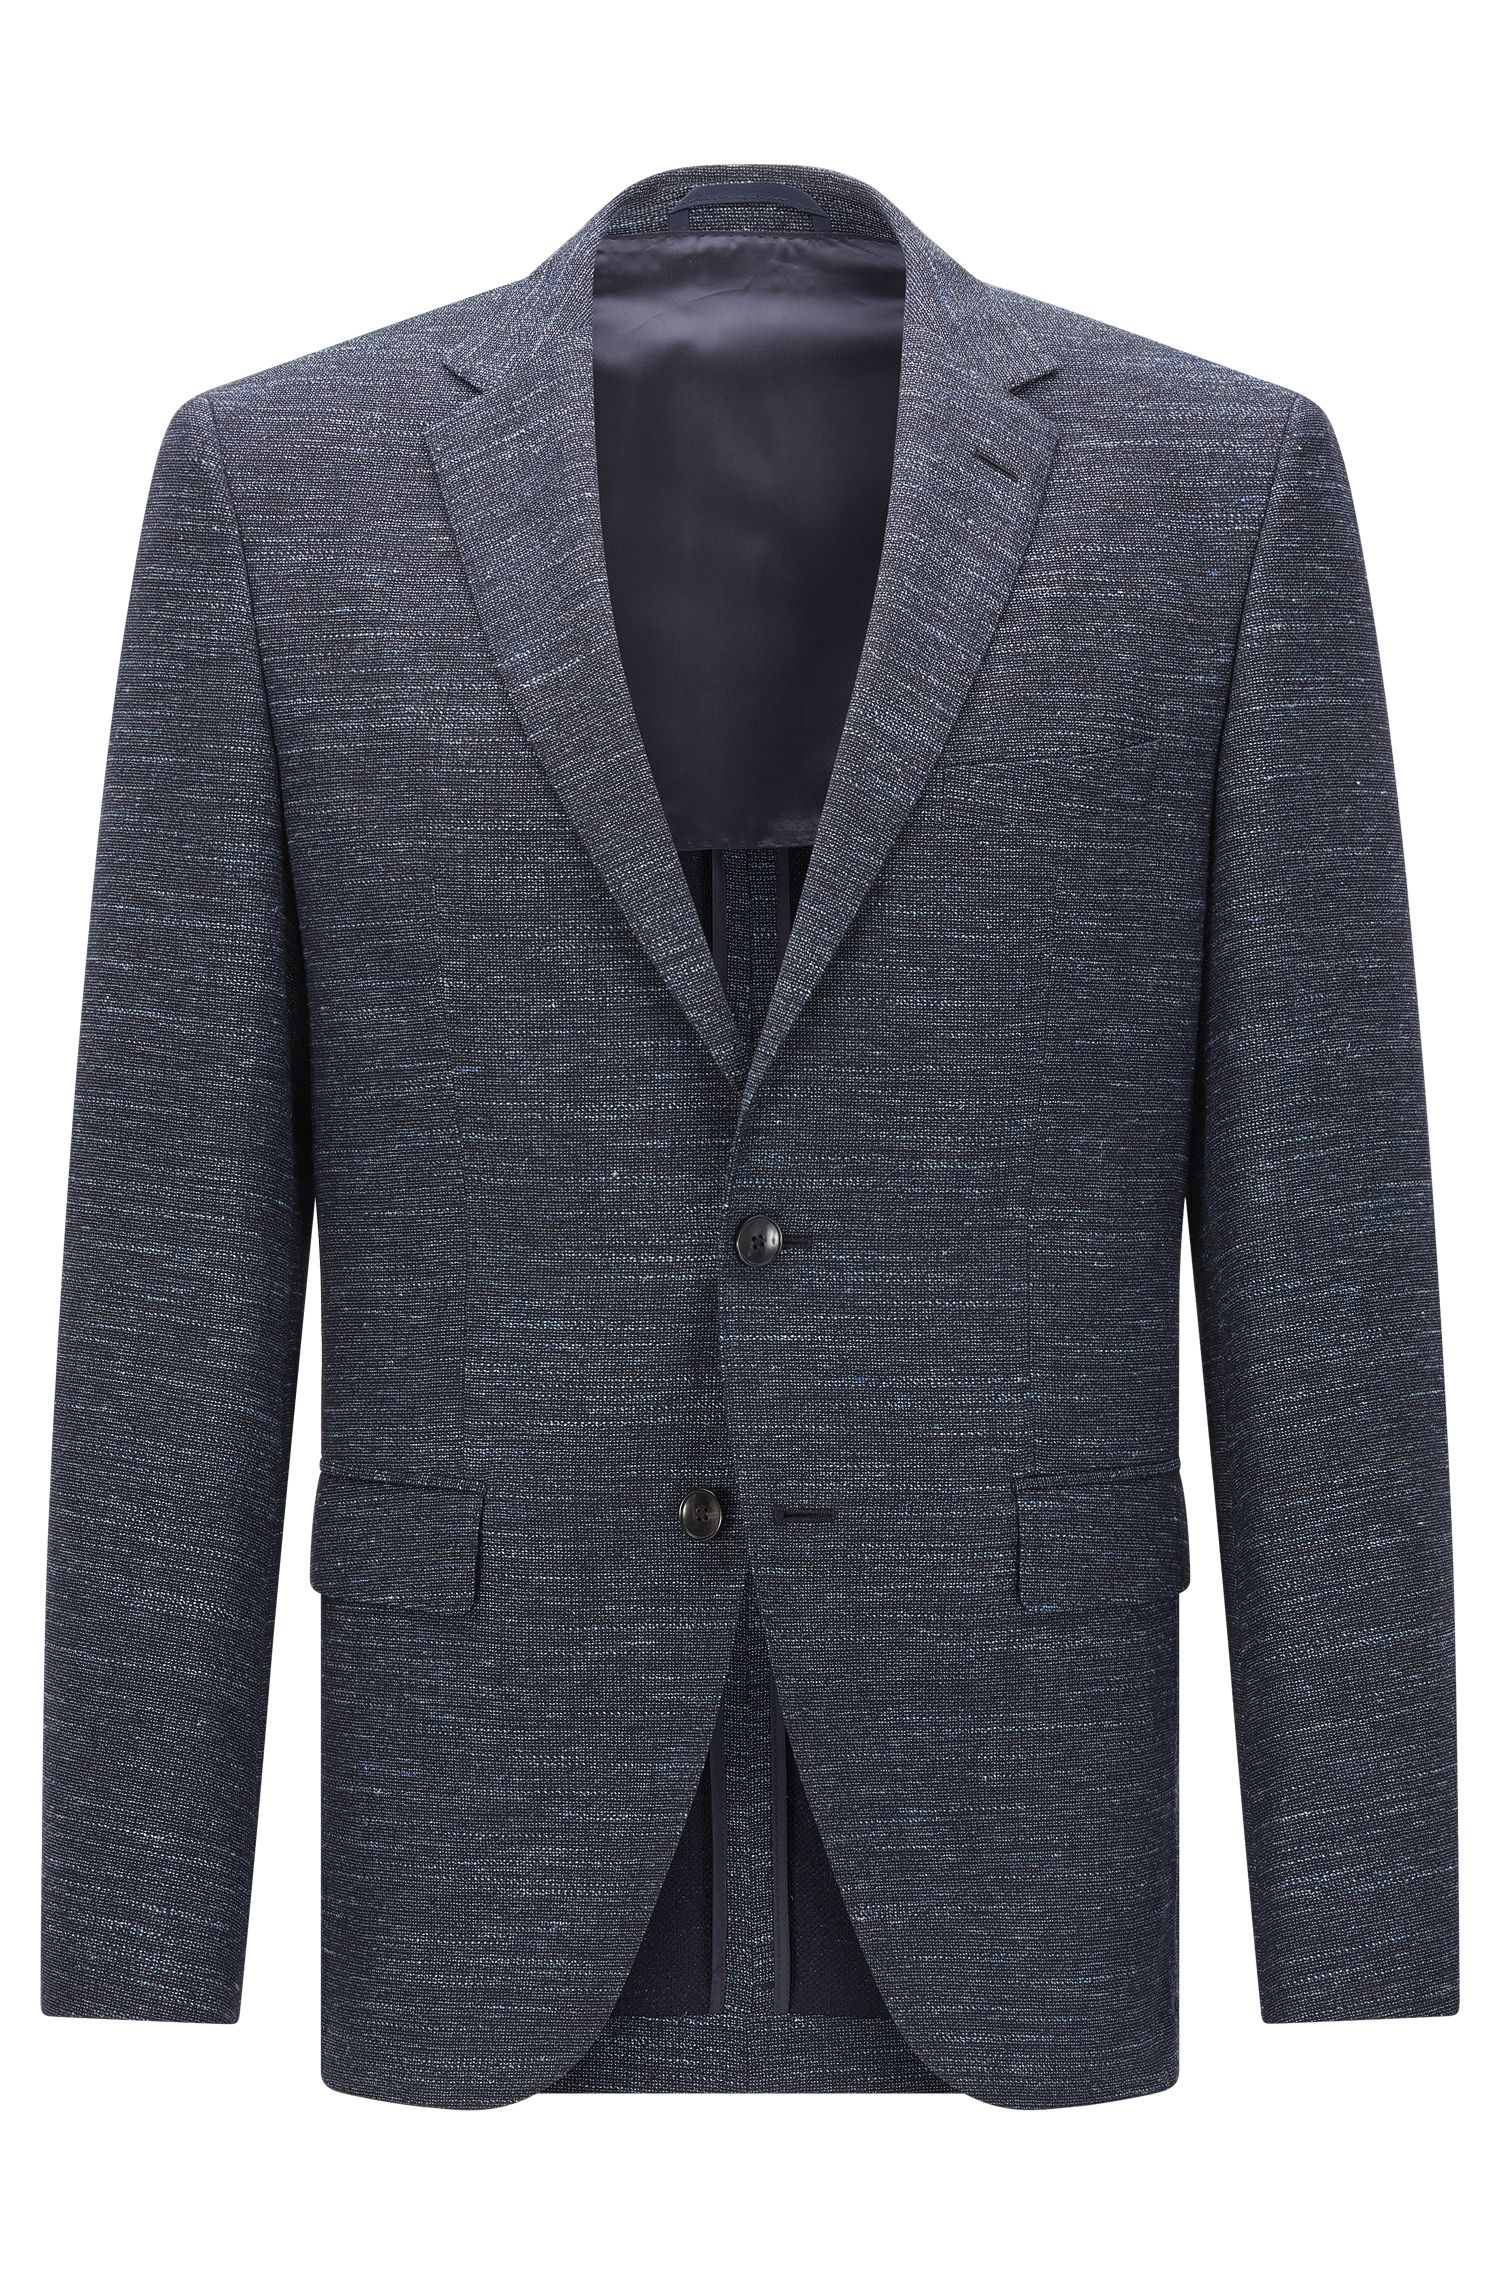 'Jestor' | Regular Fit, Virgin Wool Cotton Linen Sport Coat